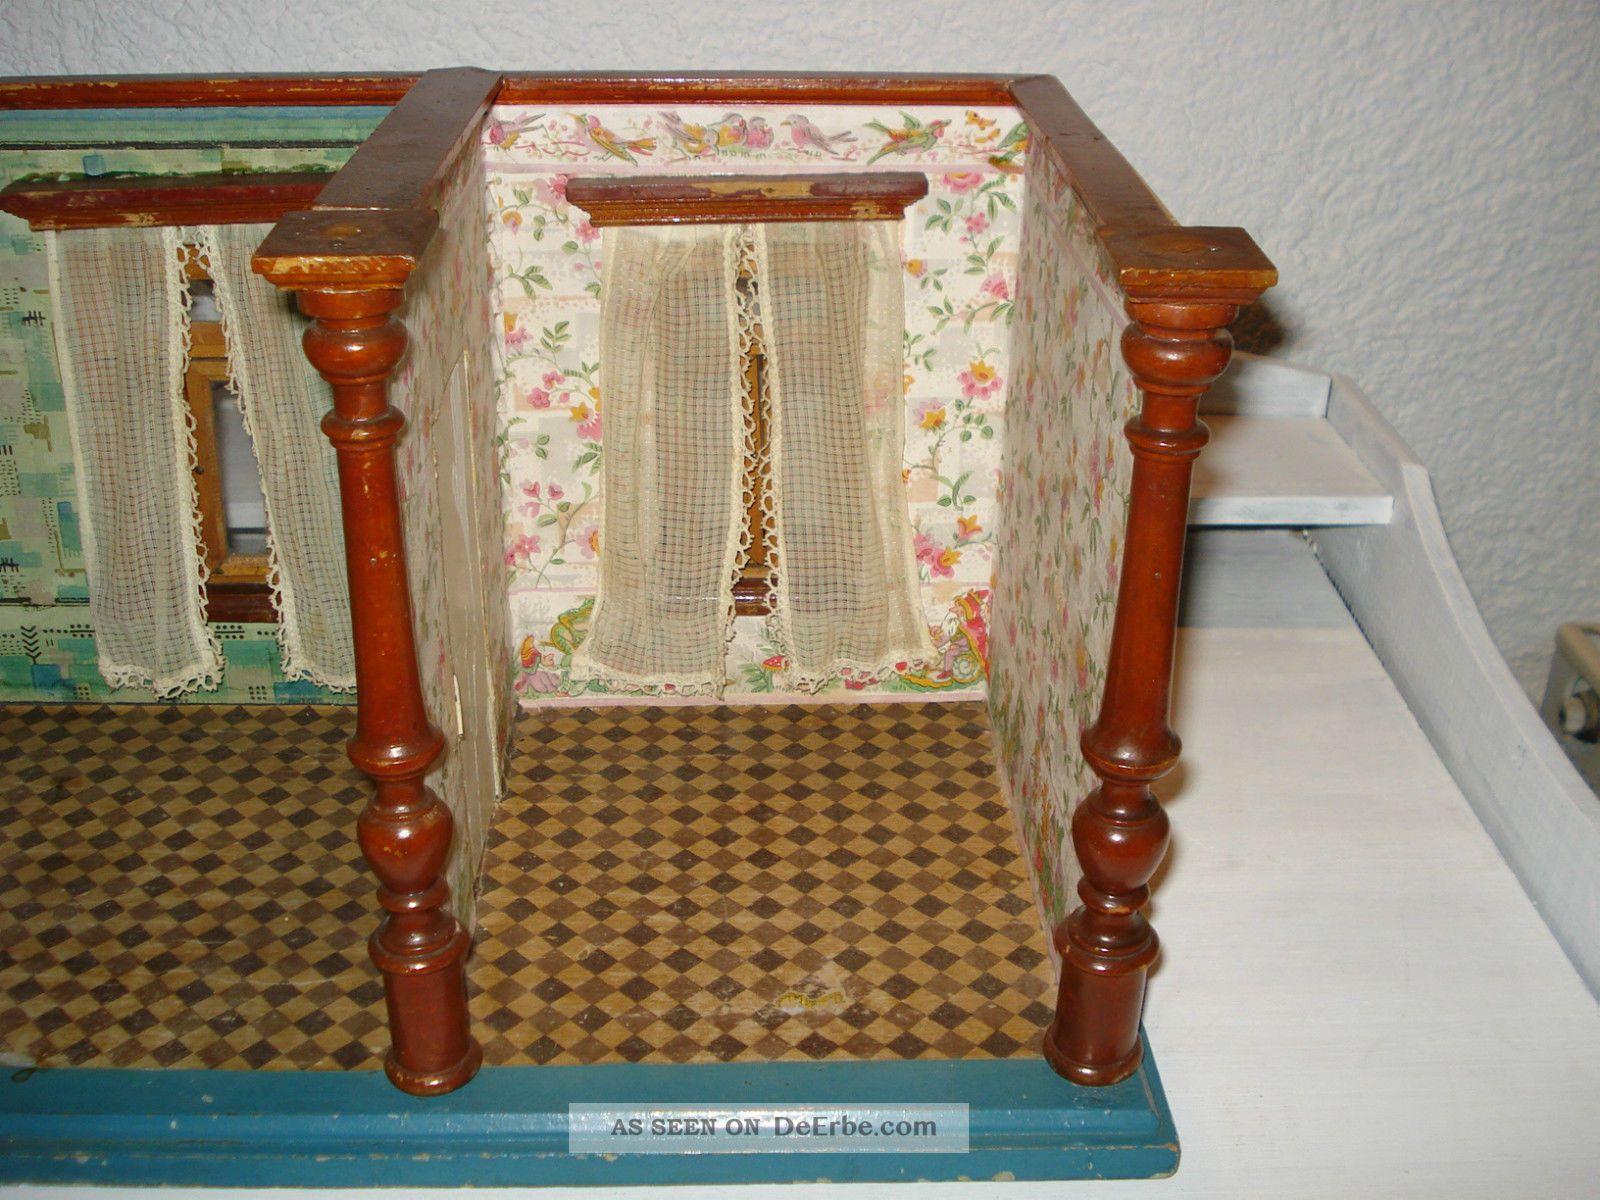 alte antike puppenstube um 1900 alte tapete und fu boden. Black Bedroom Furniture Sets. Home Design Ideas